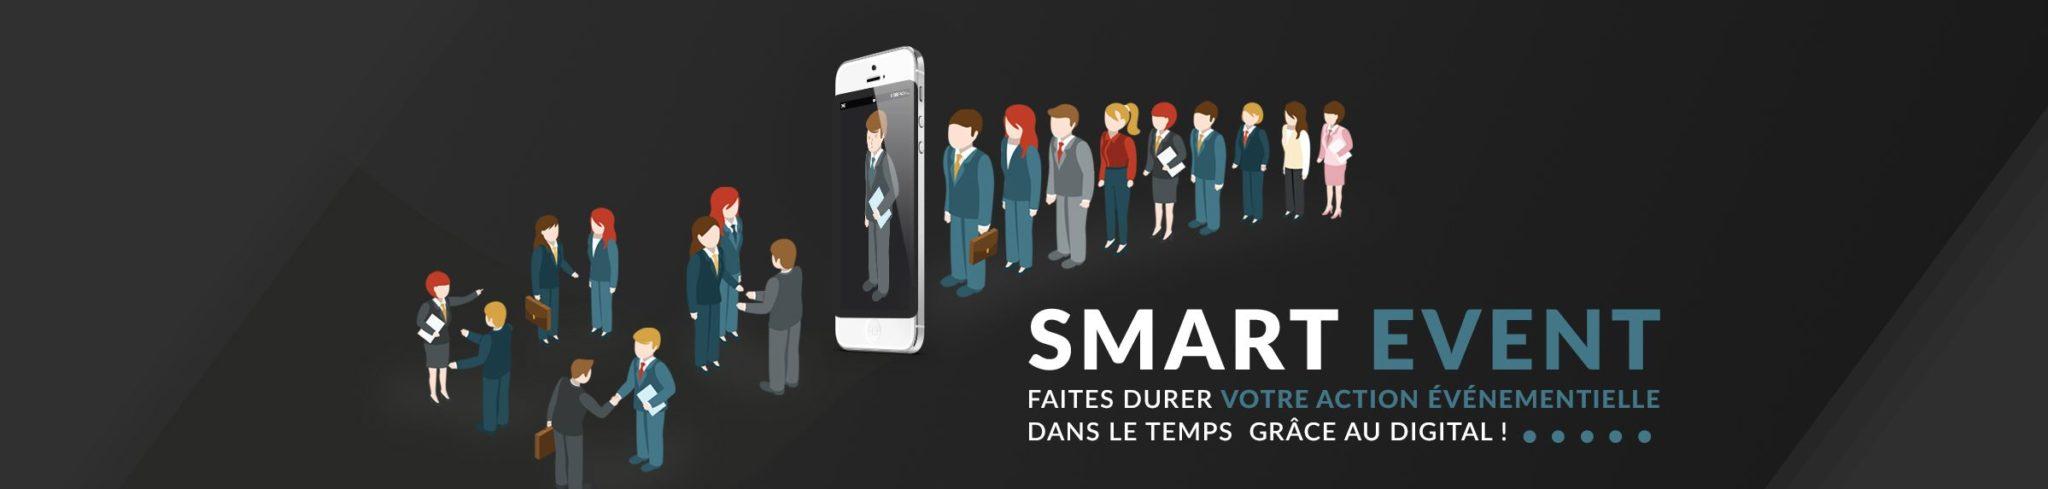 smart event